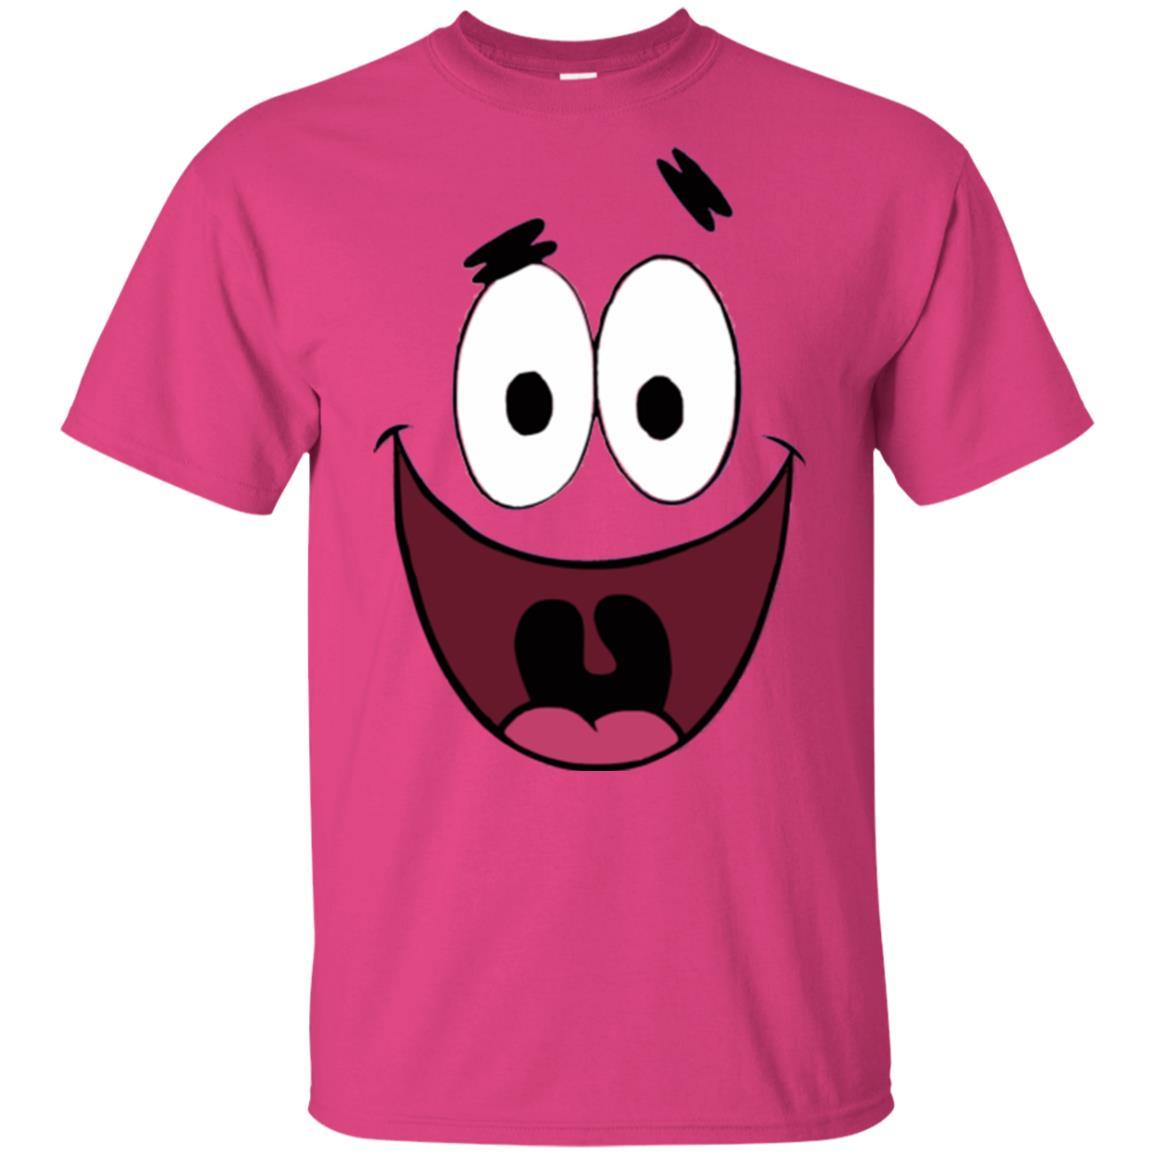 image 1805 - SpongeBob costume Patrick Star face shirt